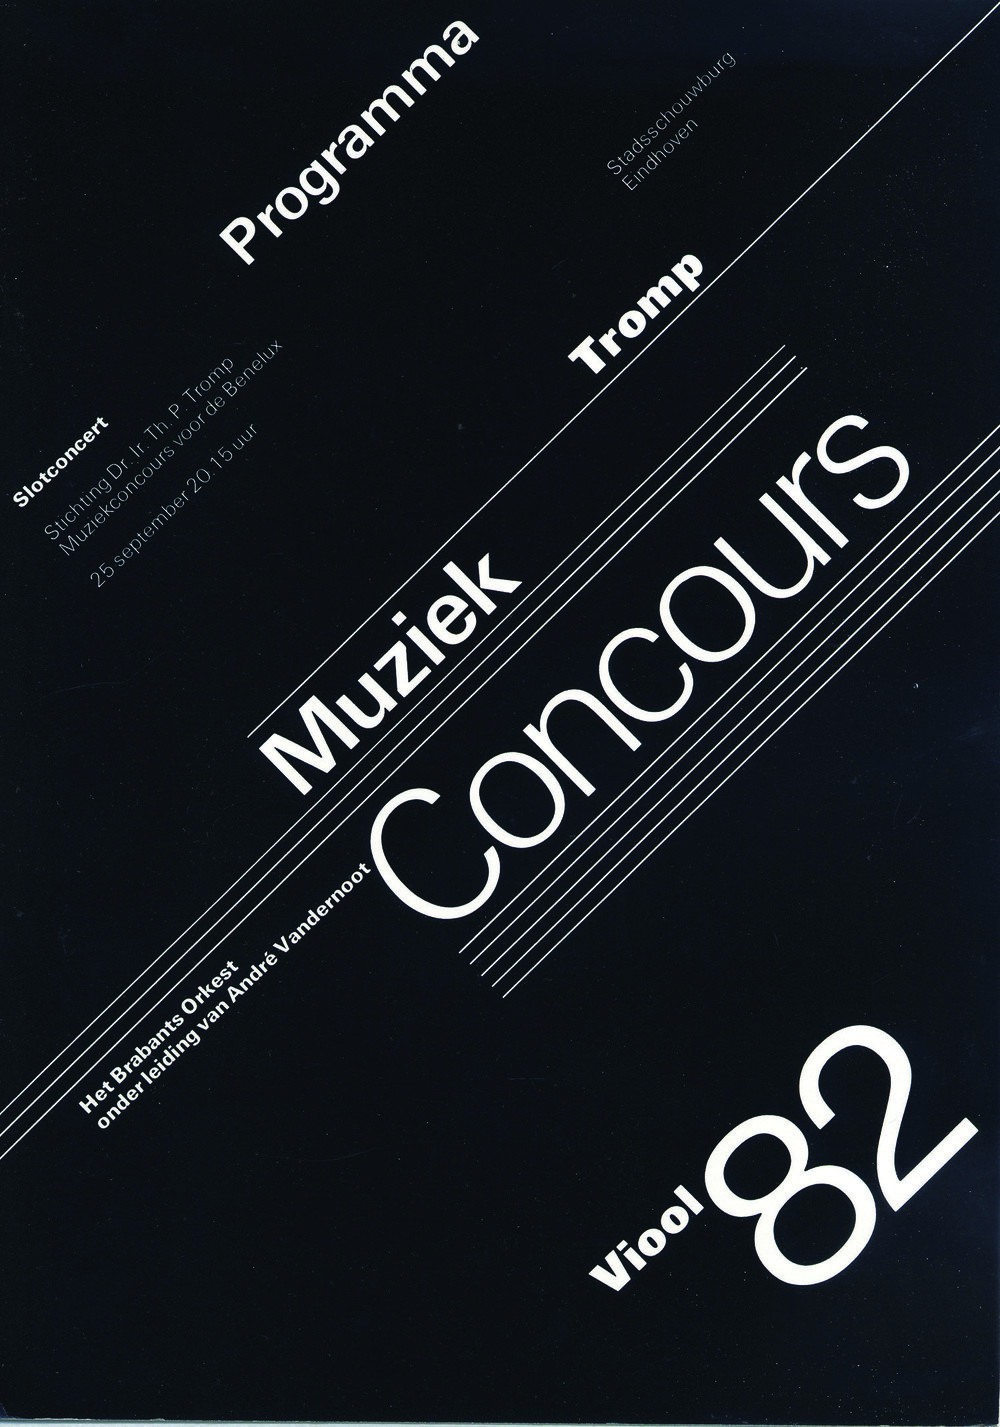 Wim-Crouwel-1.jpg